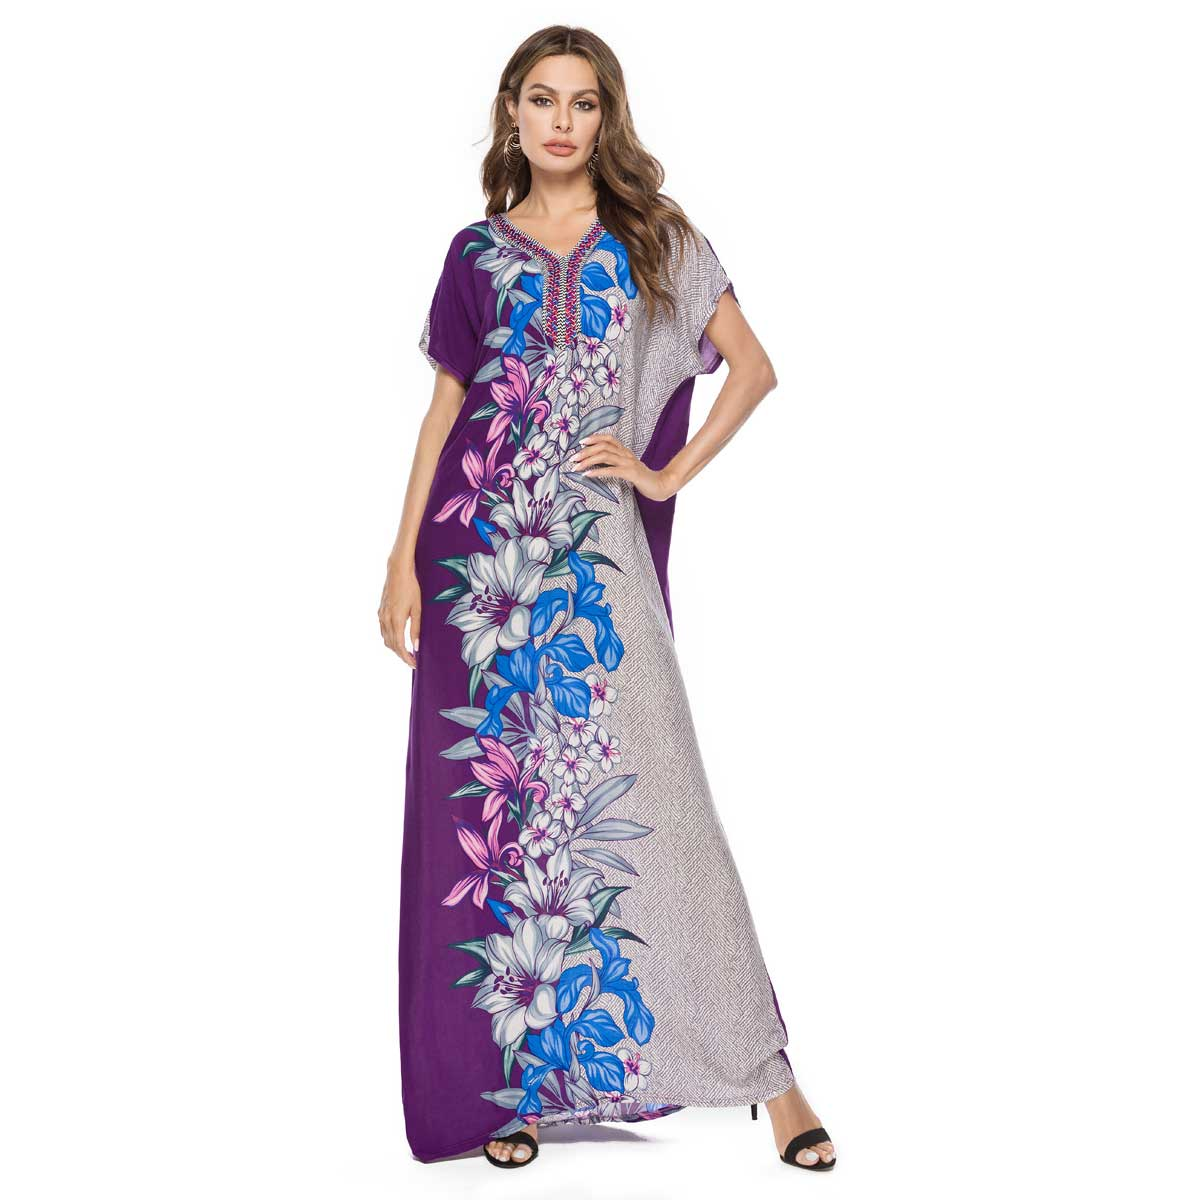 2a38977ebfd8b 2019 Summer Women Floral Printed Bohemian Maxi Dress Short Sleeve Muslim  Abaya Islamic Dubai Arabic UAE Robe Plus Size VKDR1553